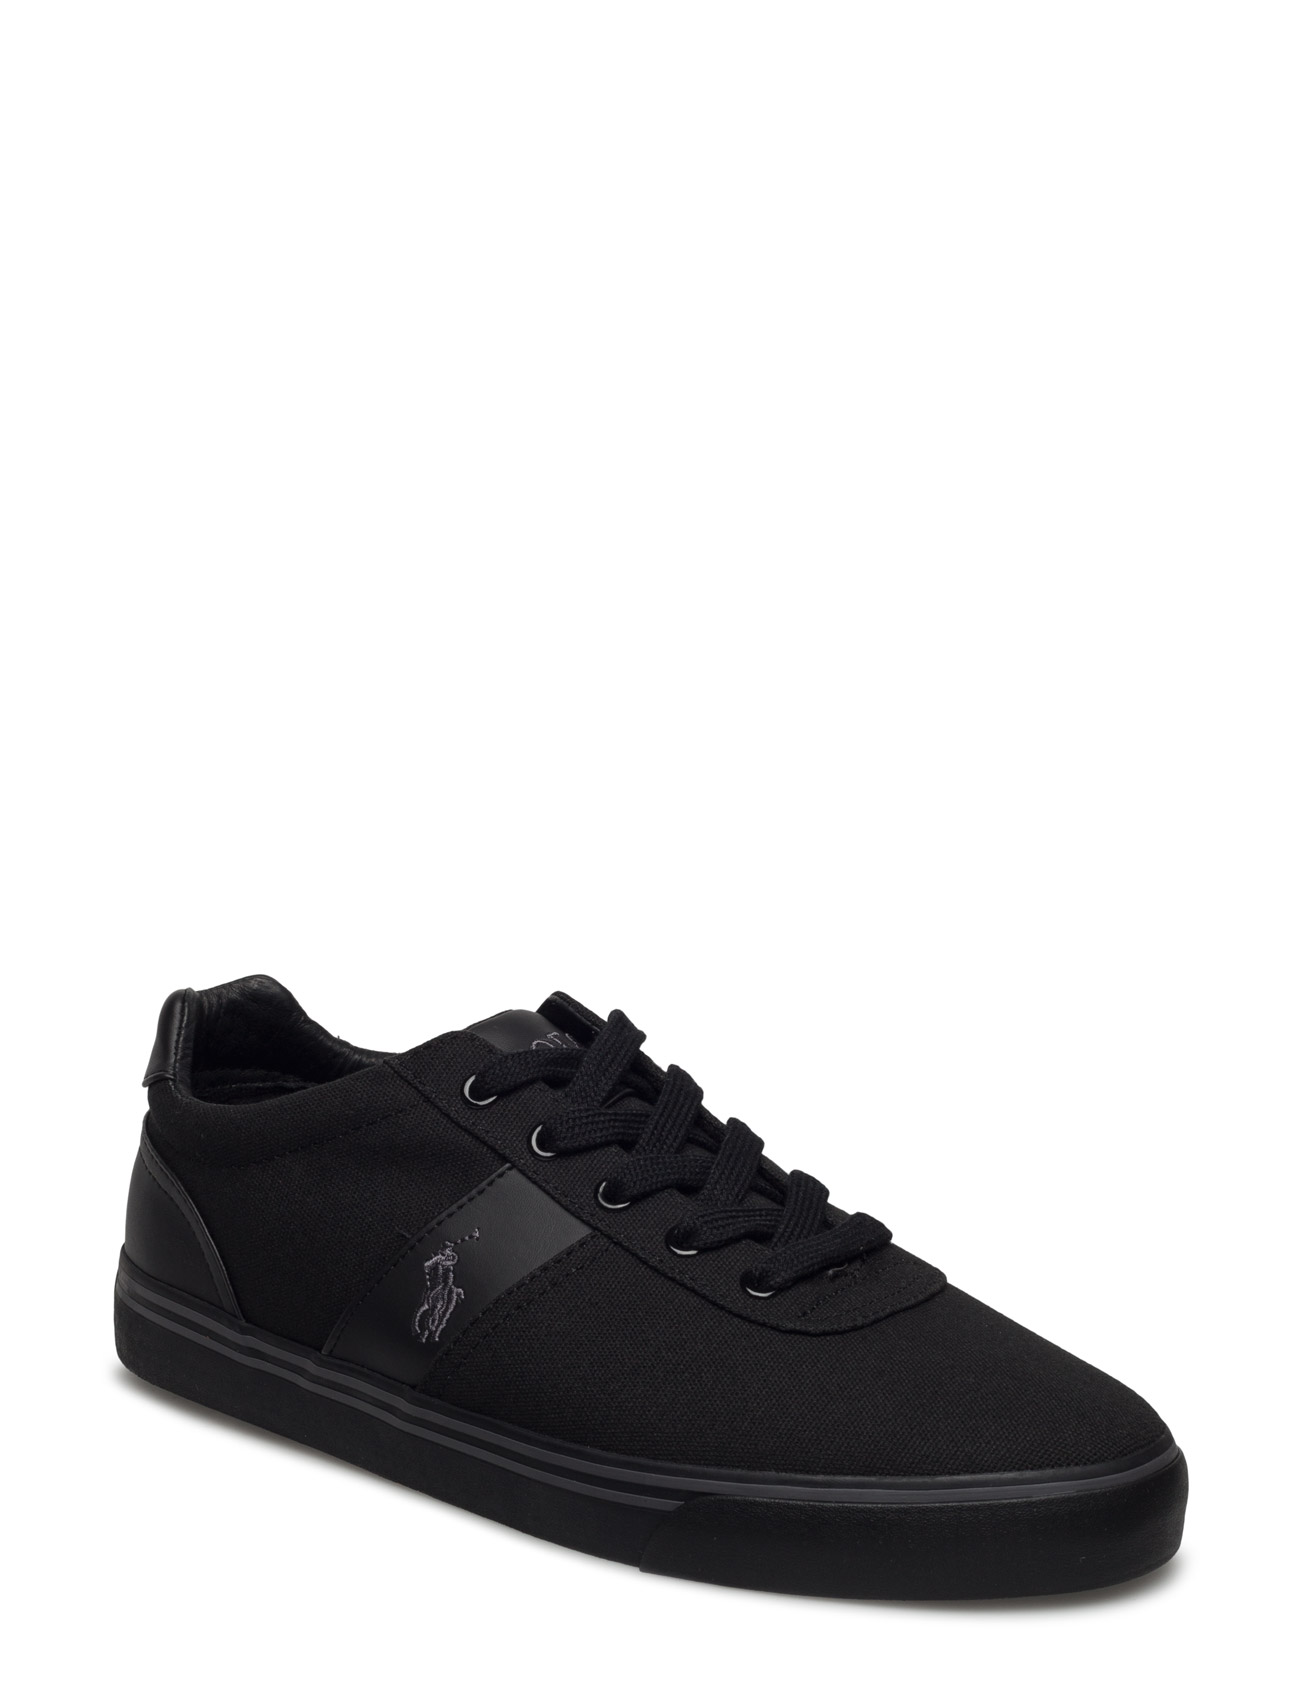 02611d18efb Hanford Canvas Sneaker (Black char bck) (£69) - Polo Ralph Lauren ...